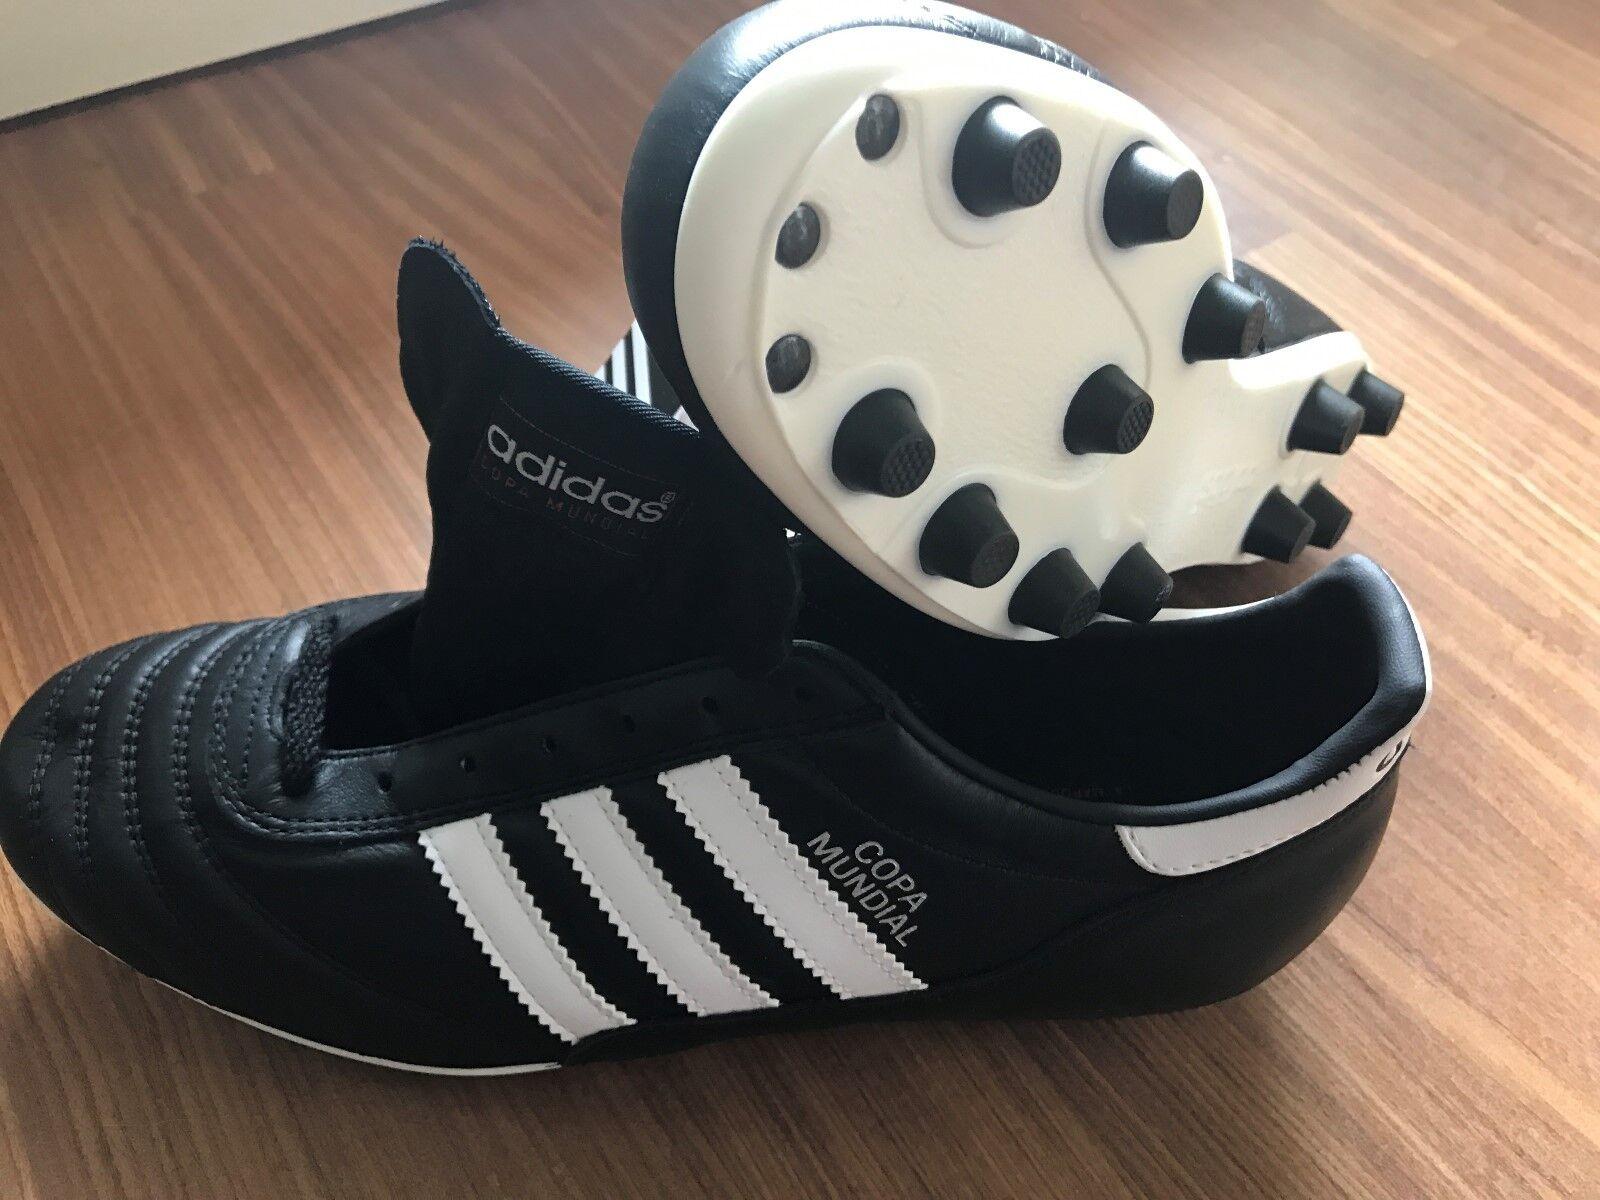 zapatos DA CALCIO ADIDAS COPA MUNDIAL 015110 MODELLO TOP - PROFESSIONALI - 545801